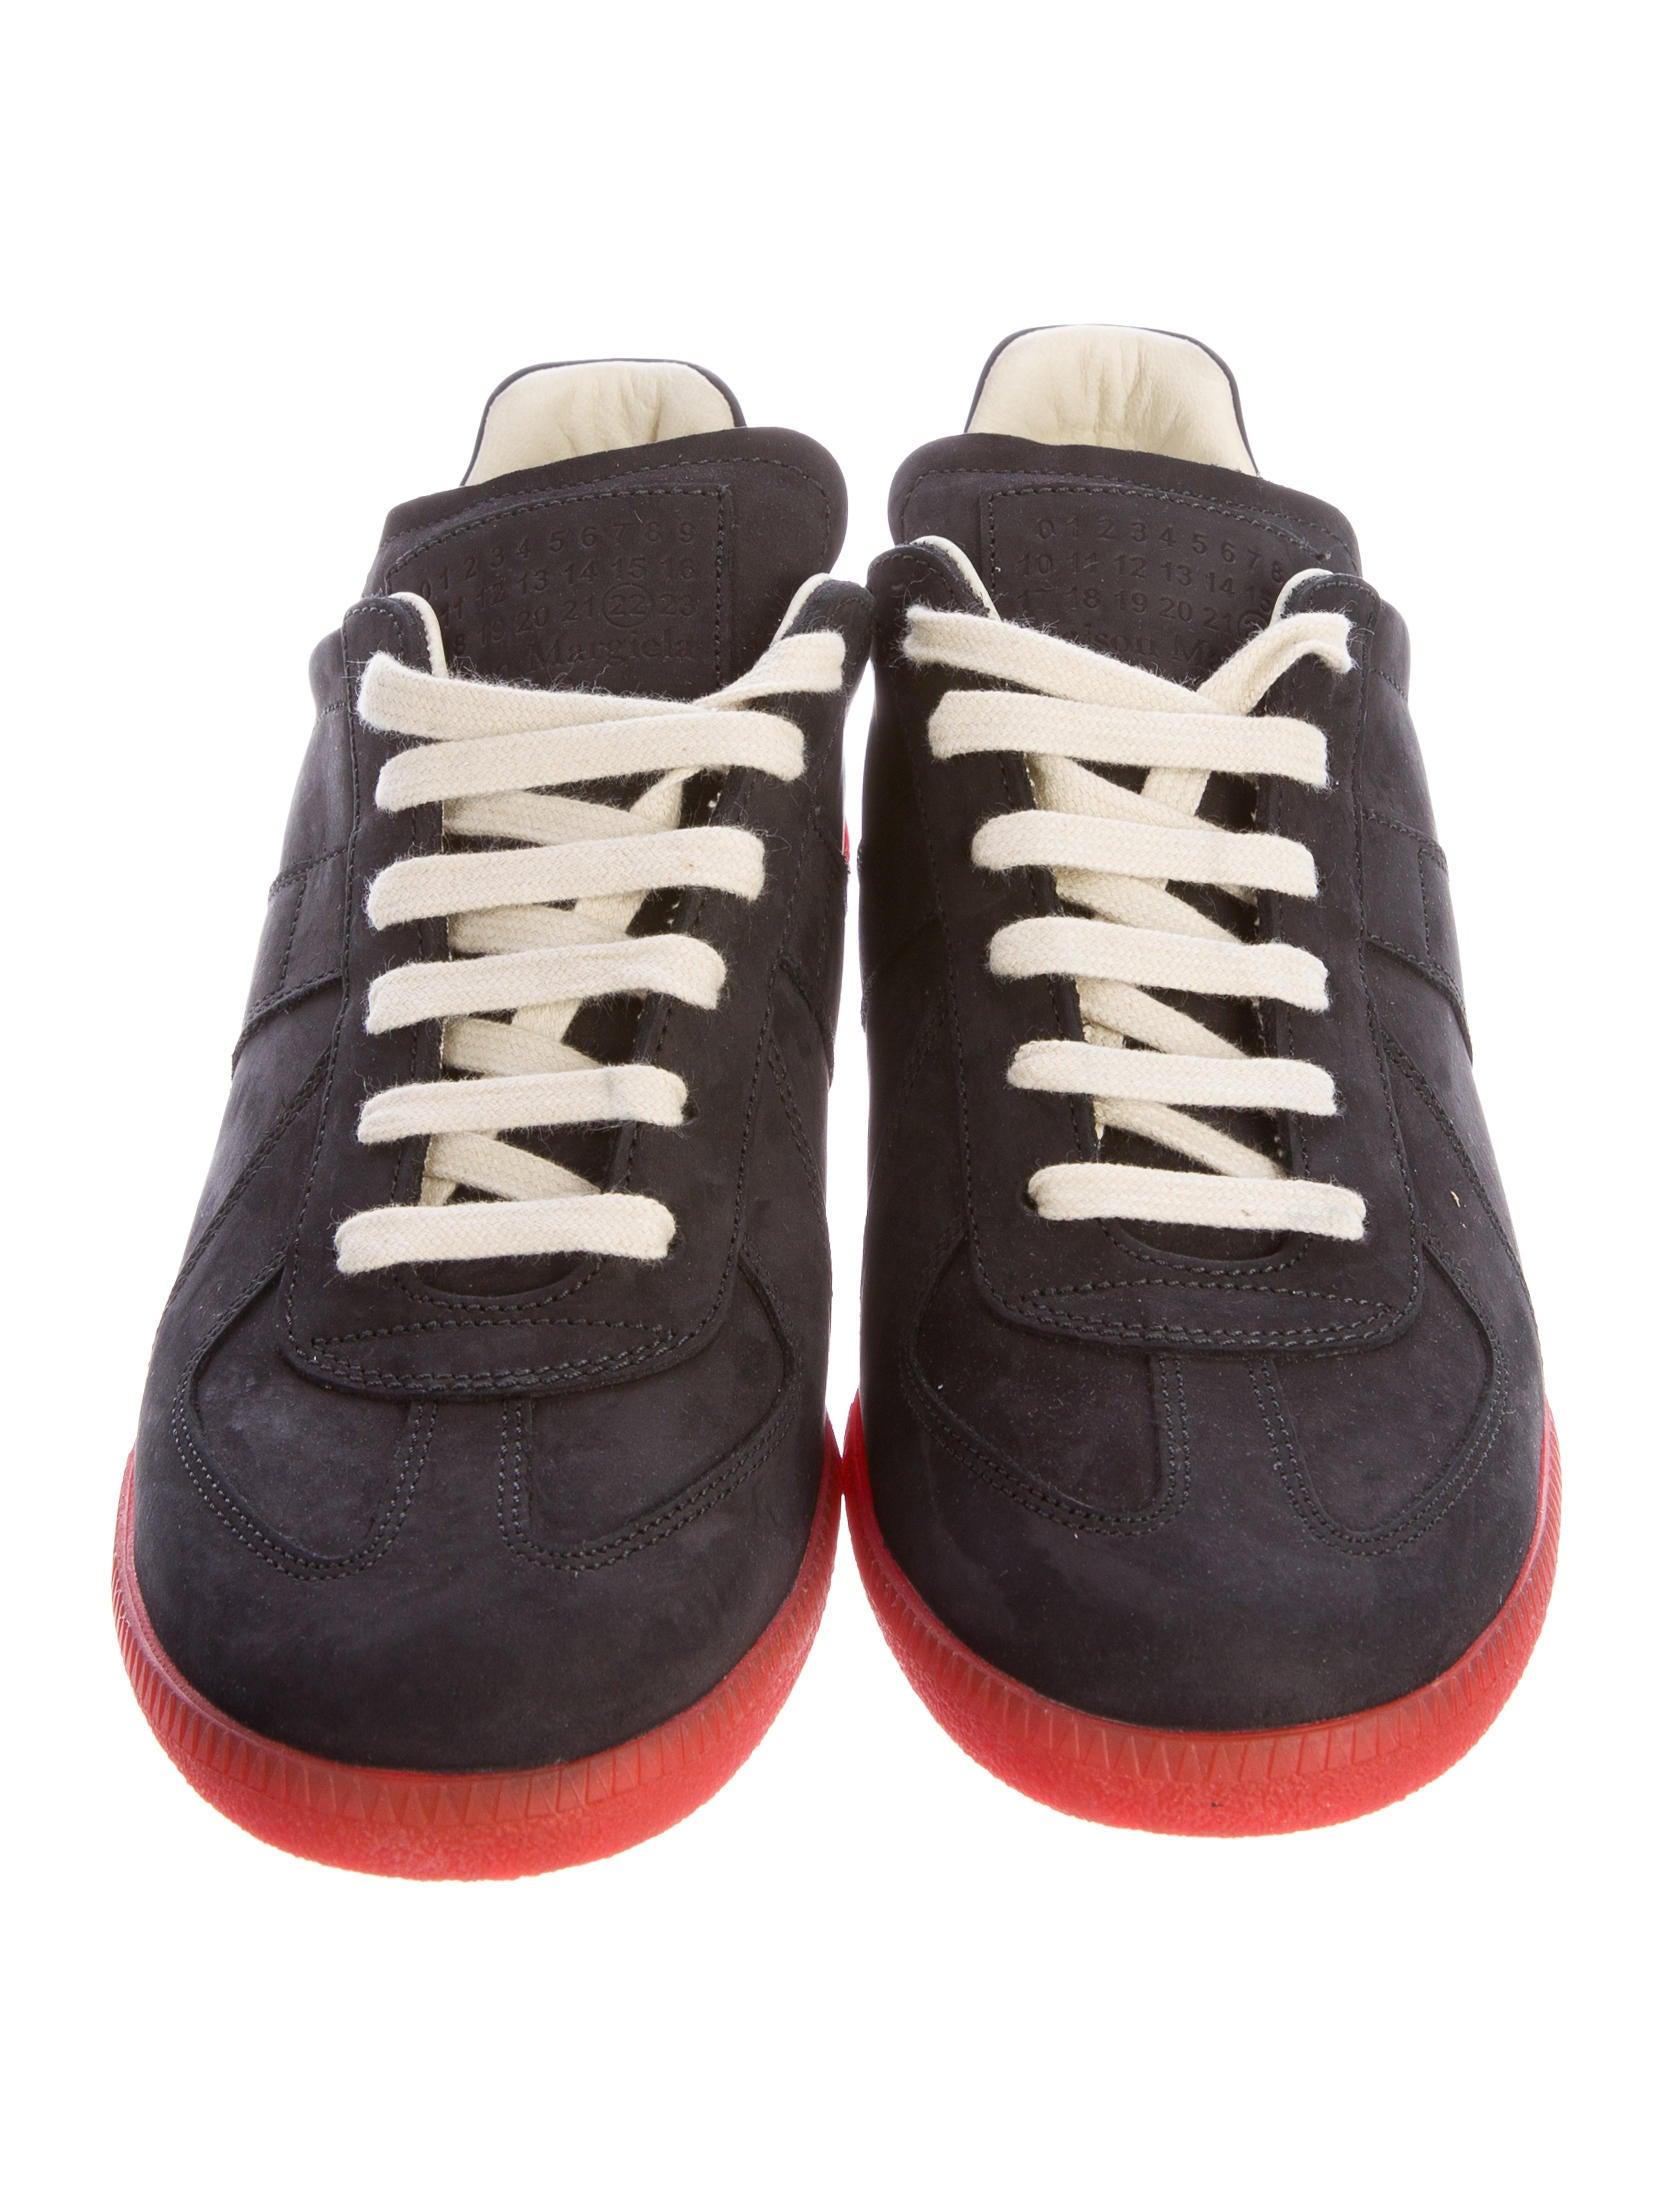 maison margiela replica nubuck sneakers mens shoes mai30784 the realreal. Black Bedroom Furniture Sets. Home Design Ideas